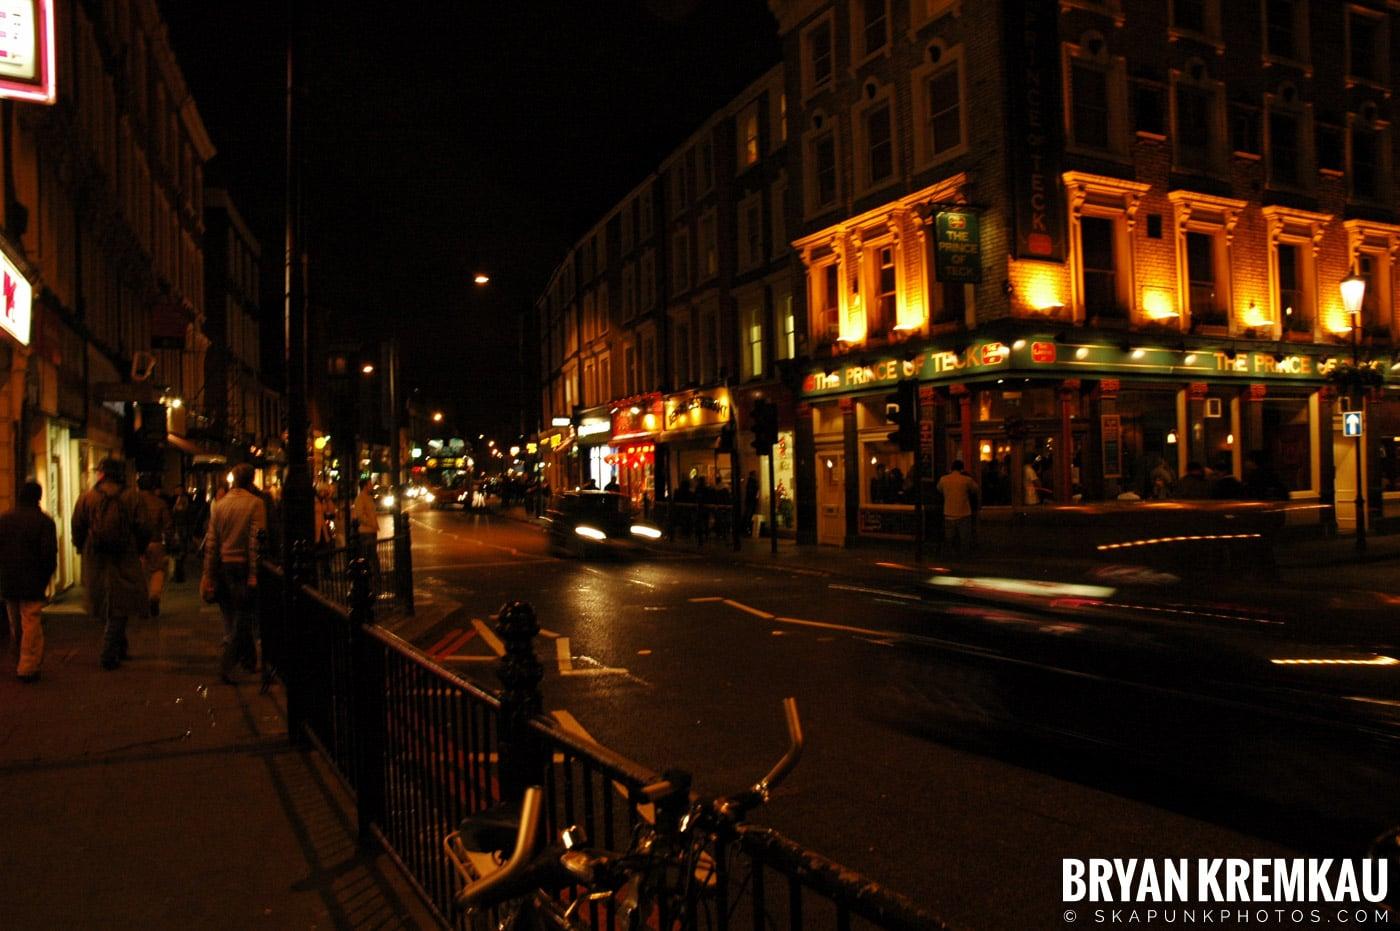 London, England - Day 3 - 12.18.05 (11)